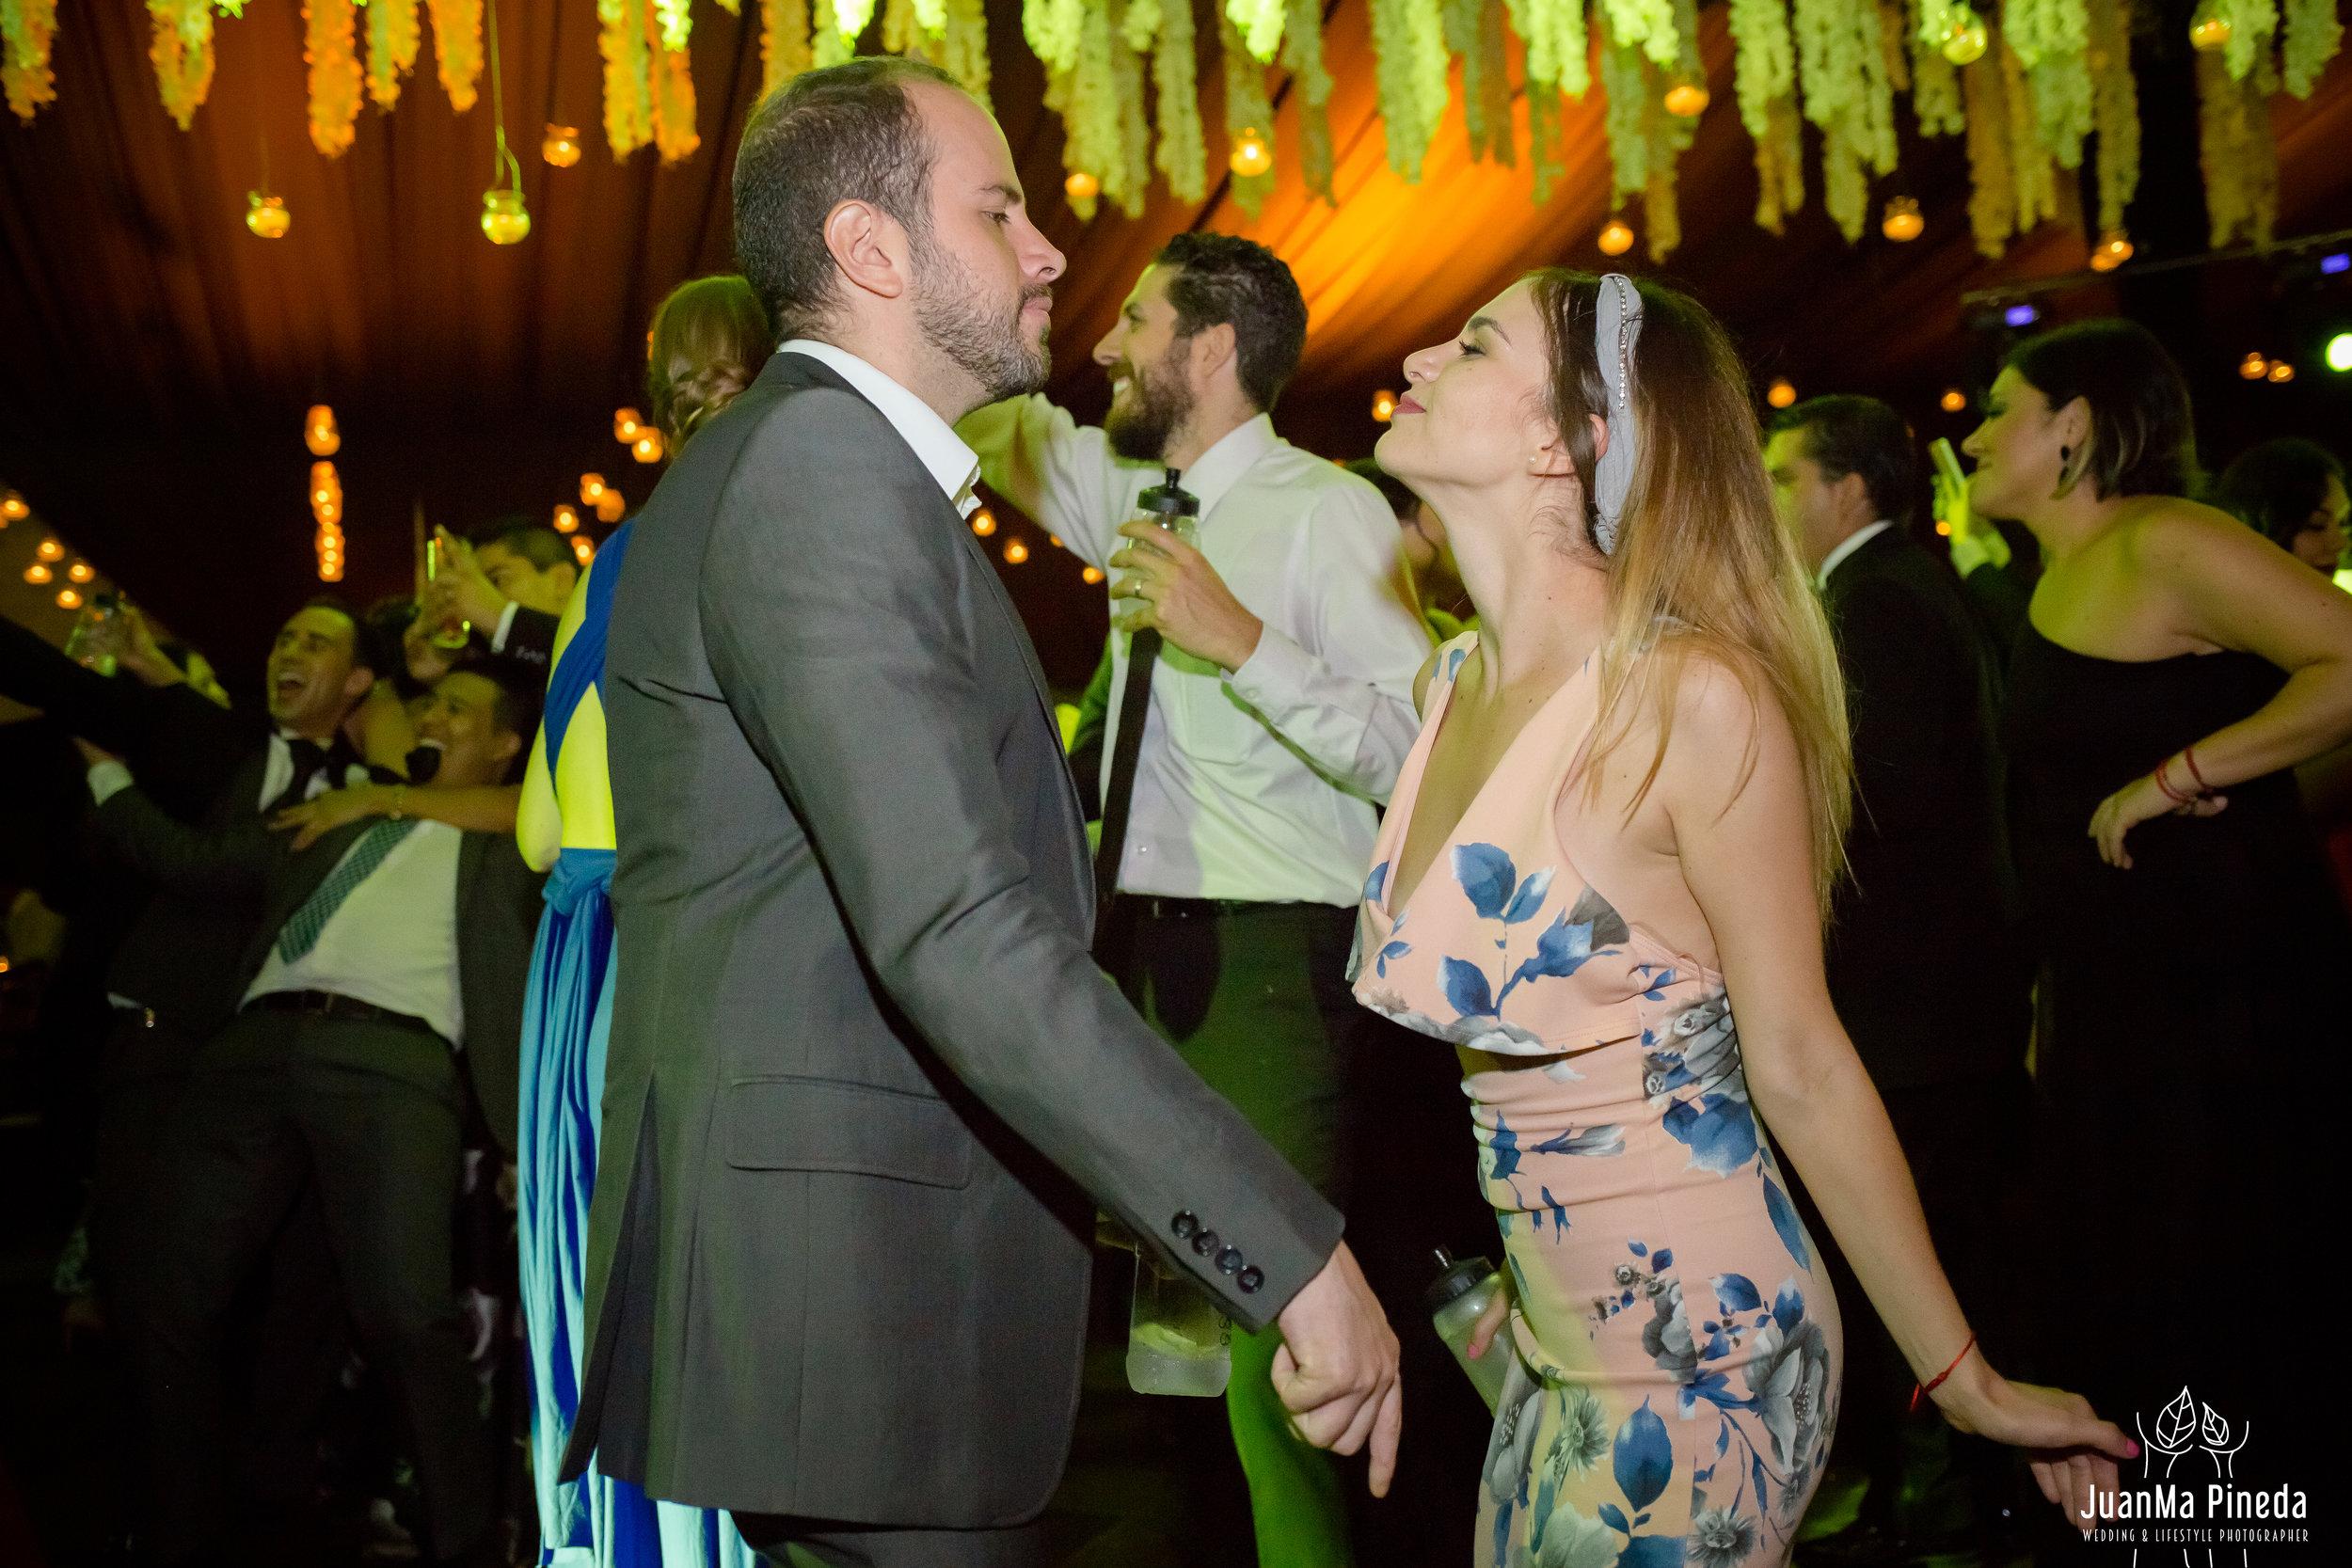 Wedding+Day+Photographer-1-4.jpg